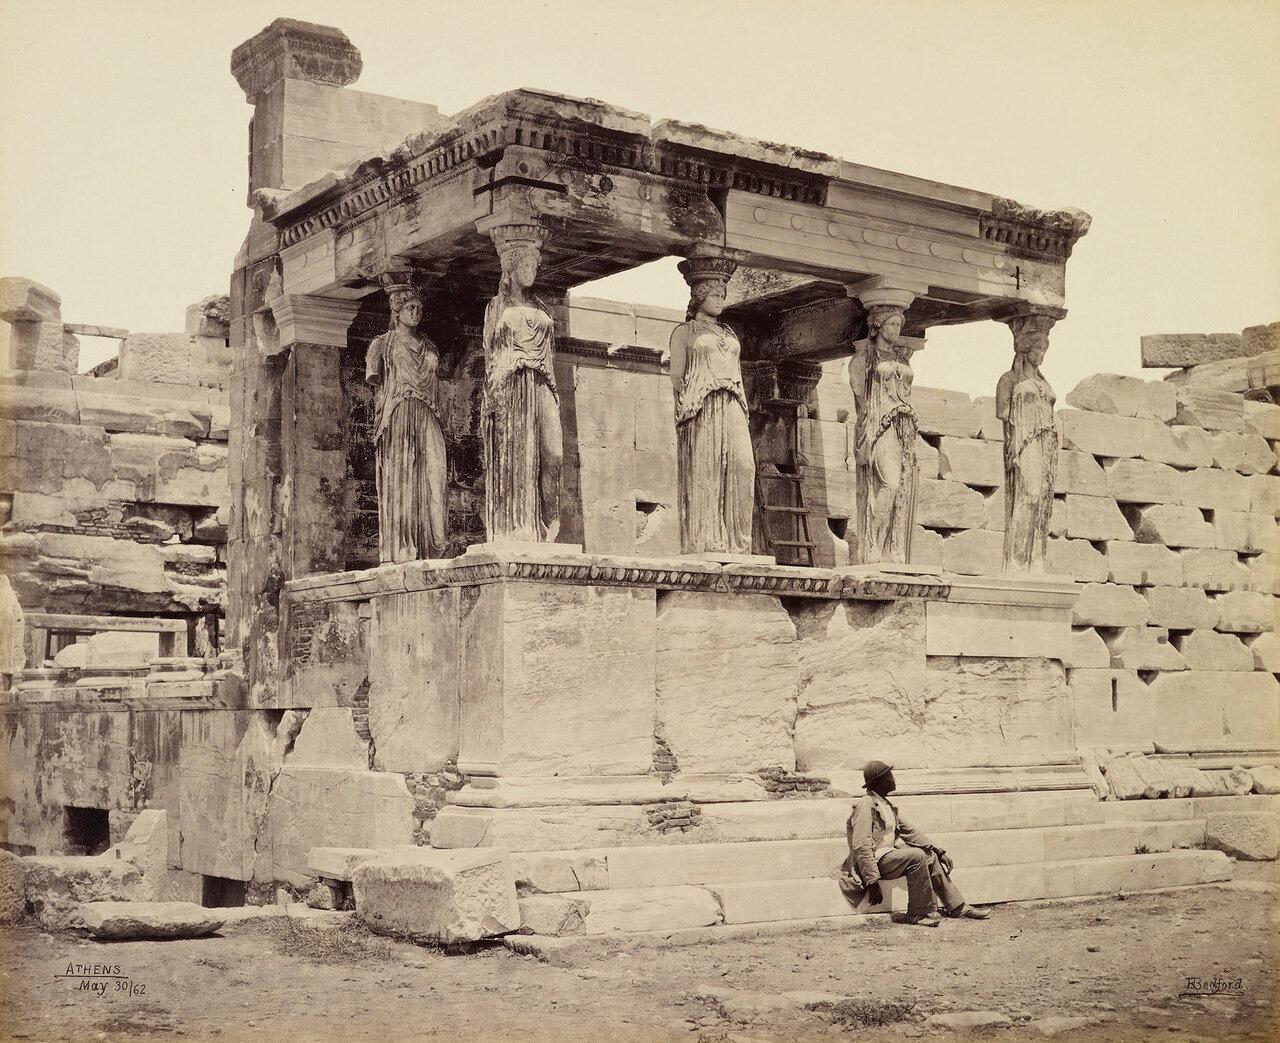 30 мая 1862. Кариатида Эрехтейона. Афины